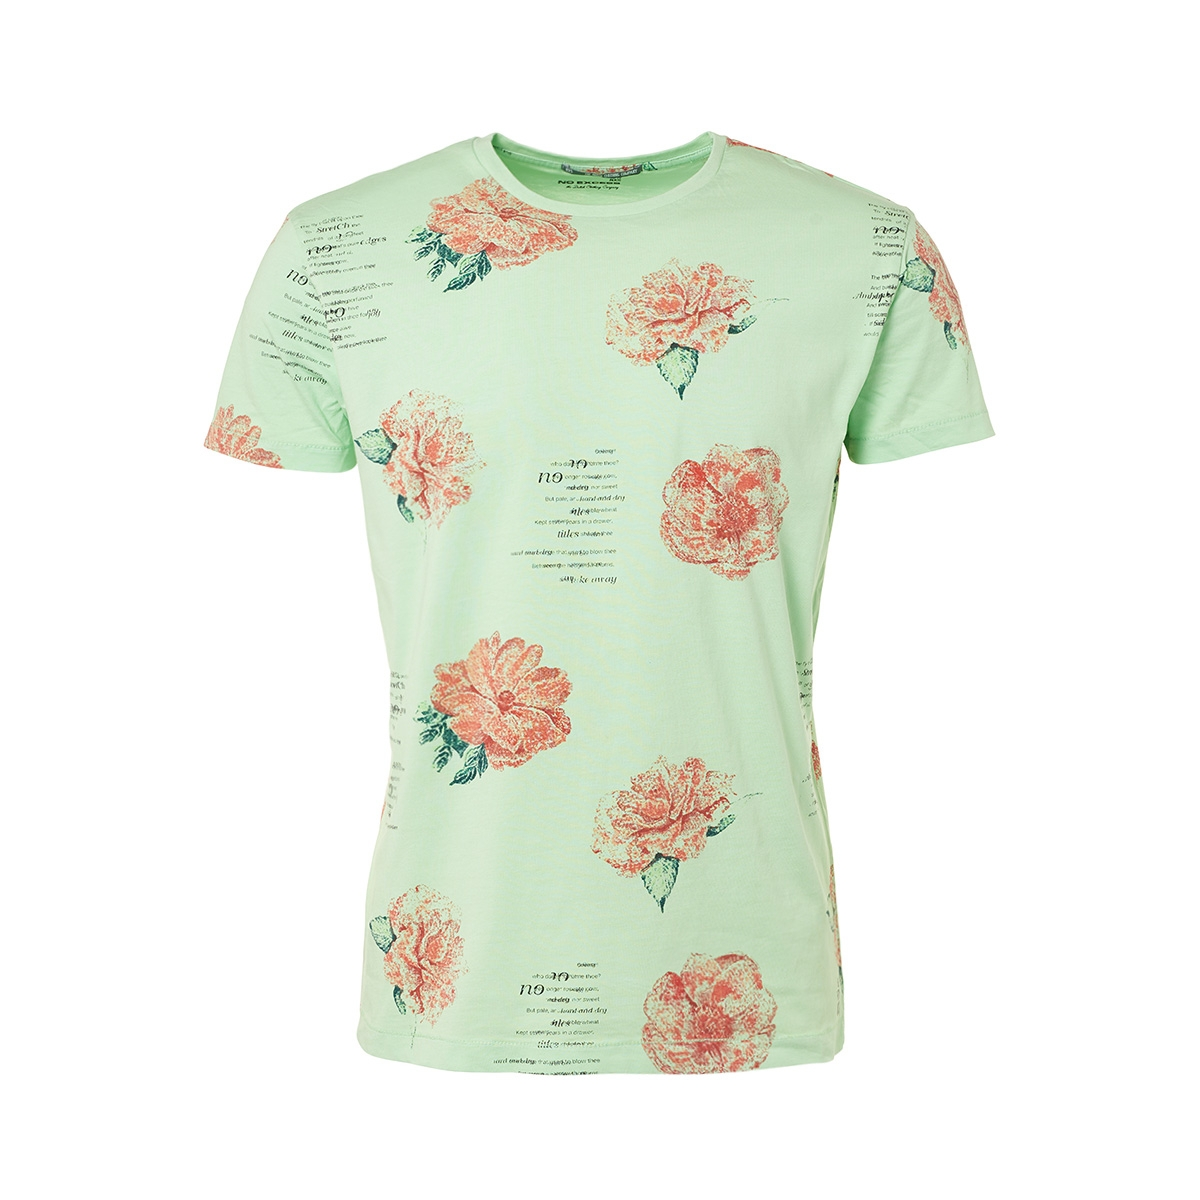 t shirt printed 91340609 no-excess t-shirt 051 lt green